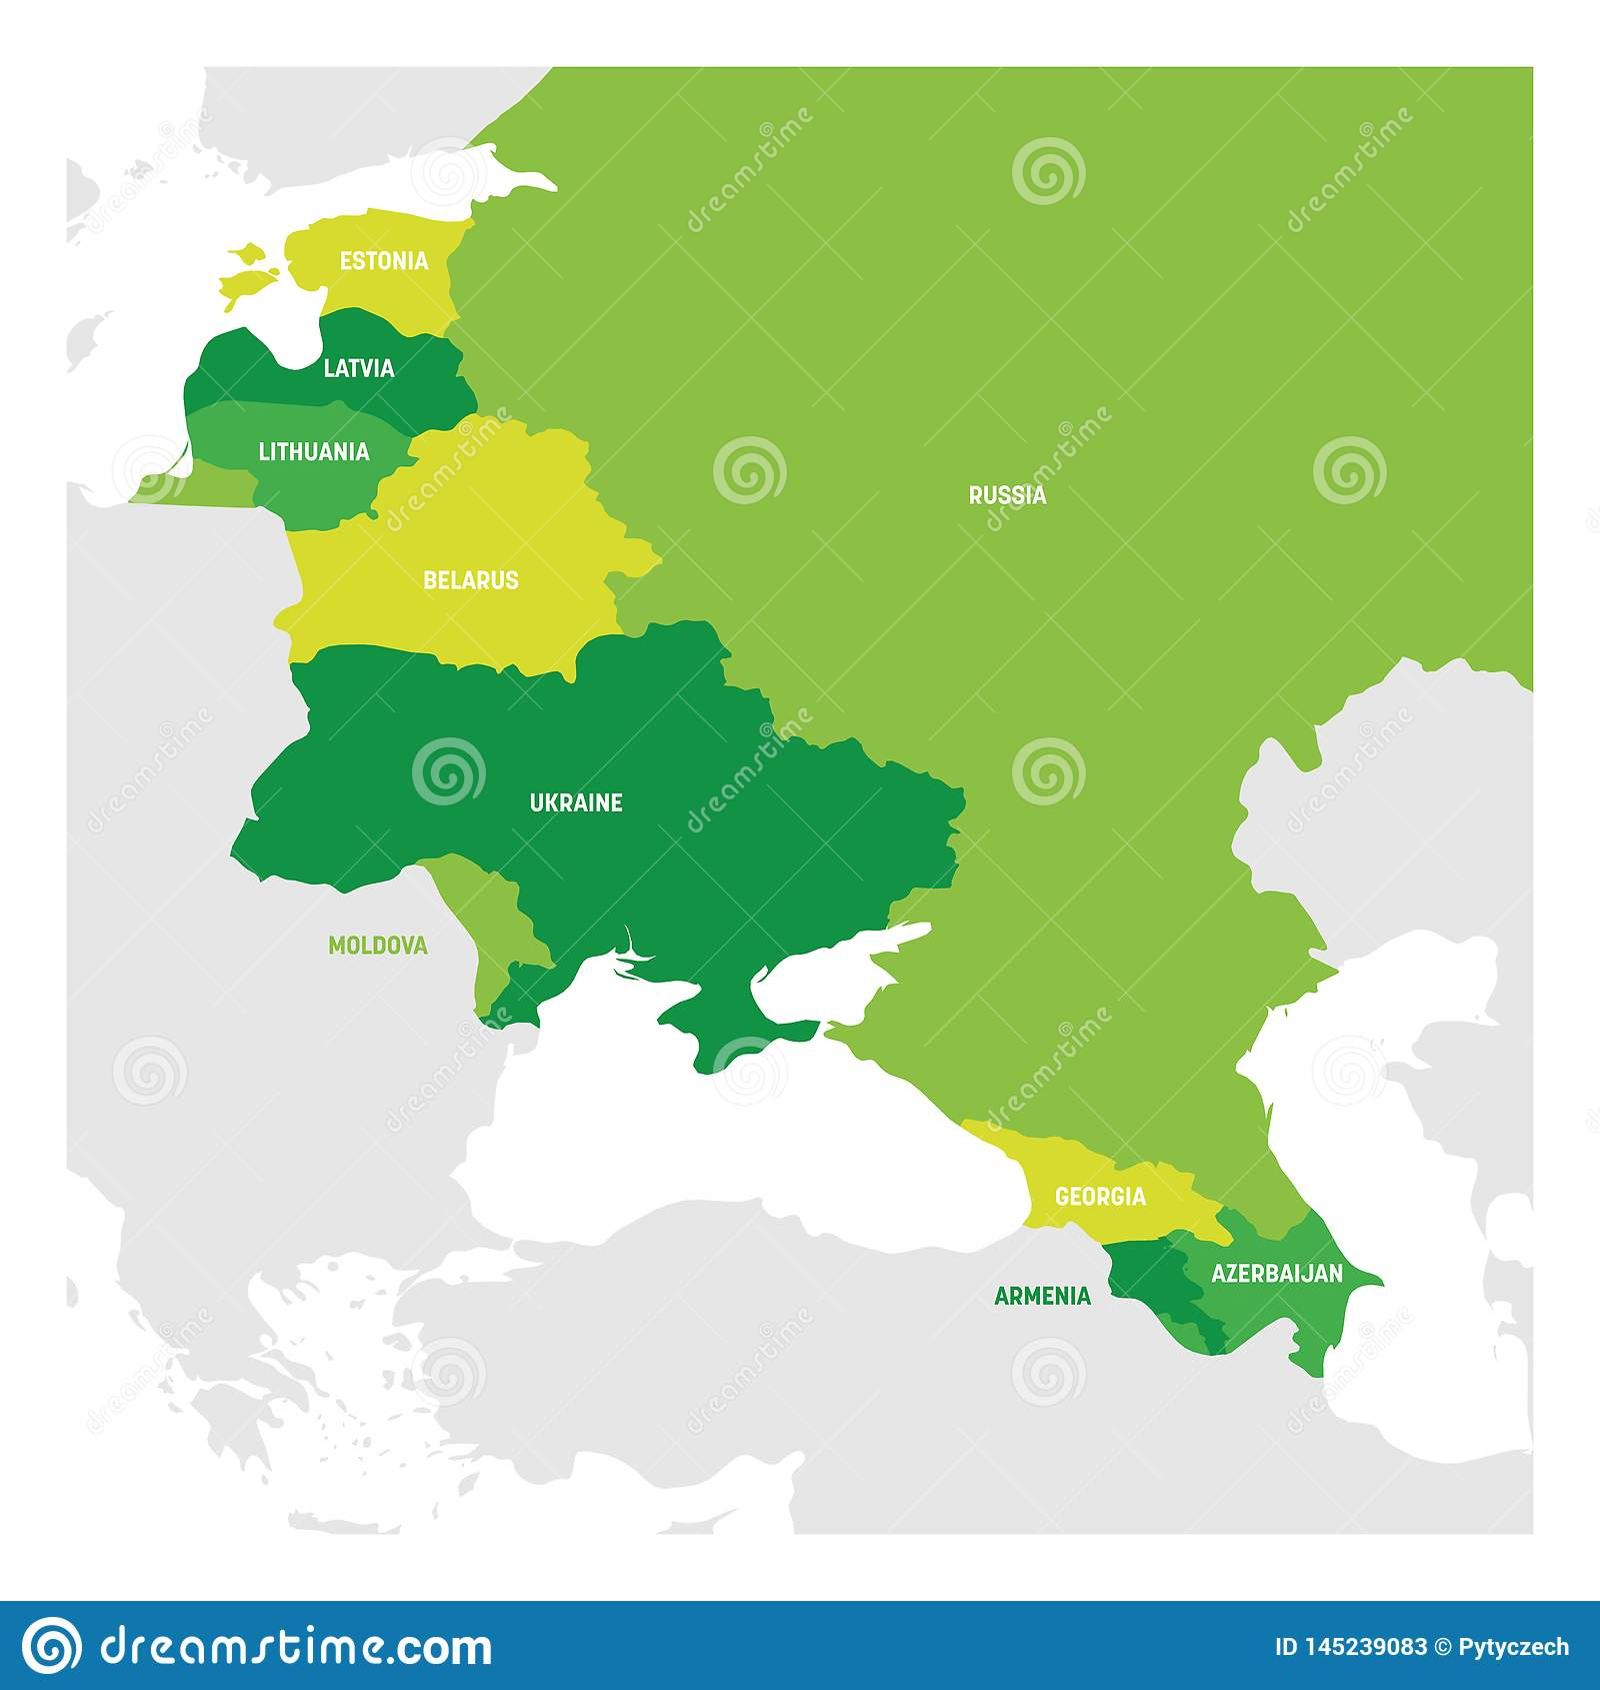 East Europe Region. Map Of Countries In Eastern Europe. Post ...